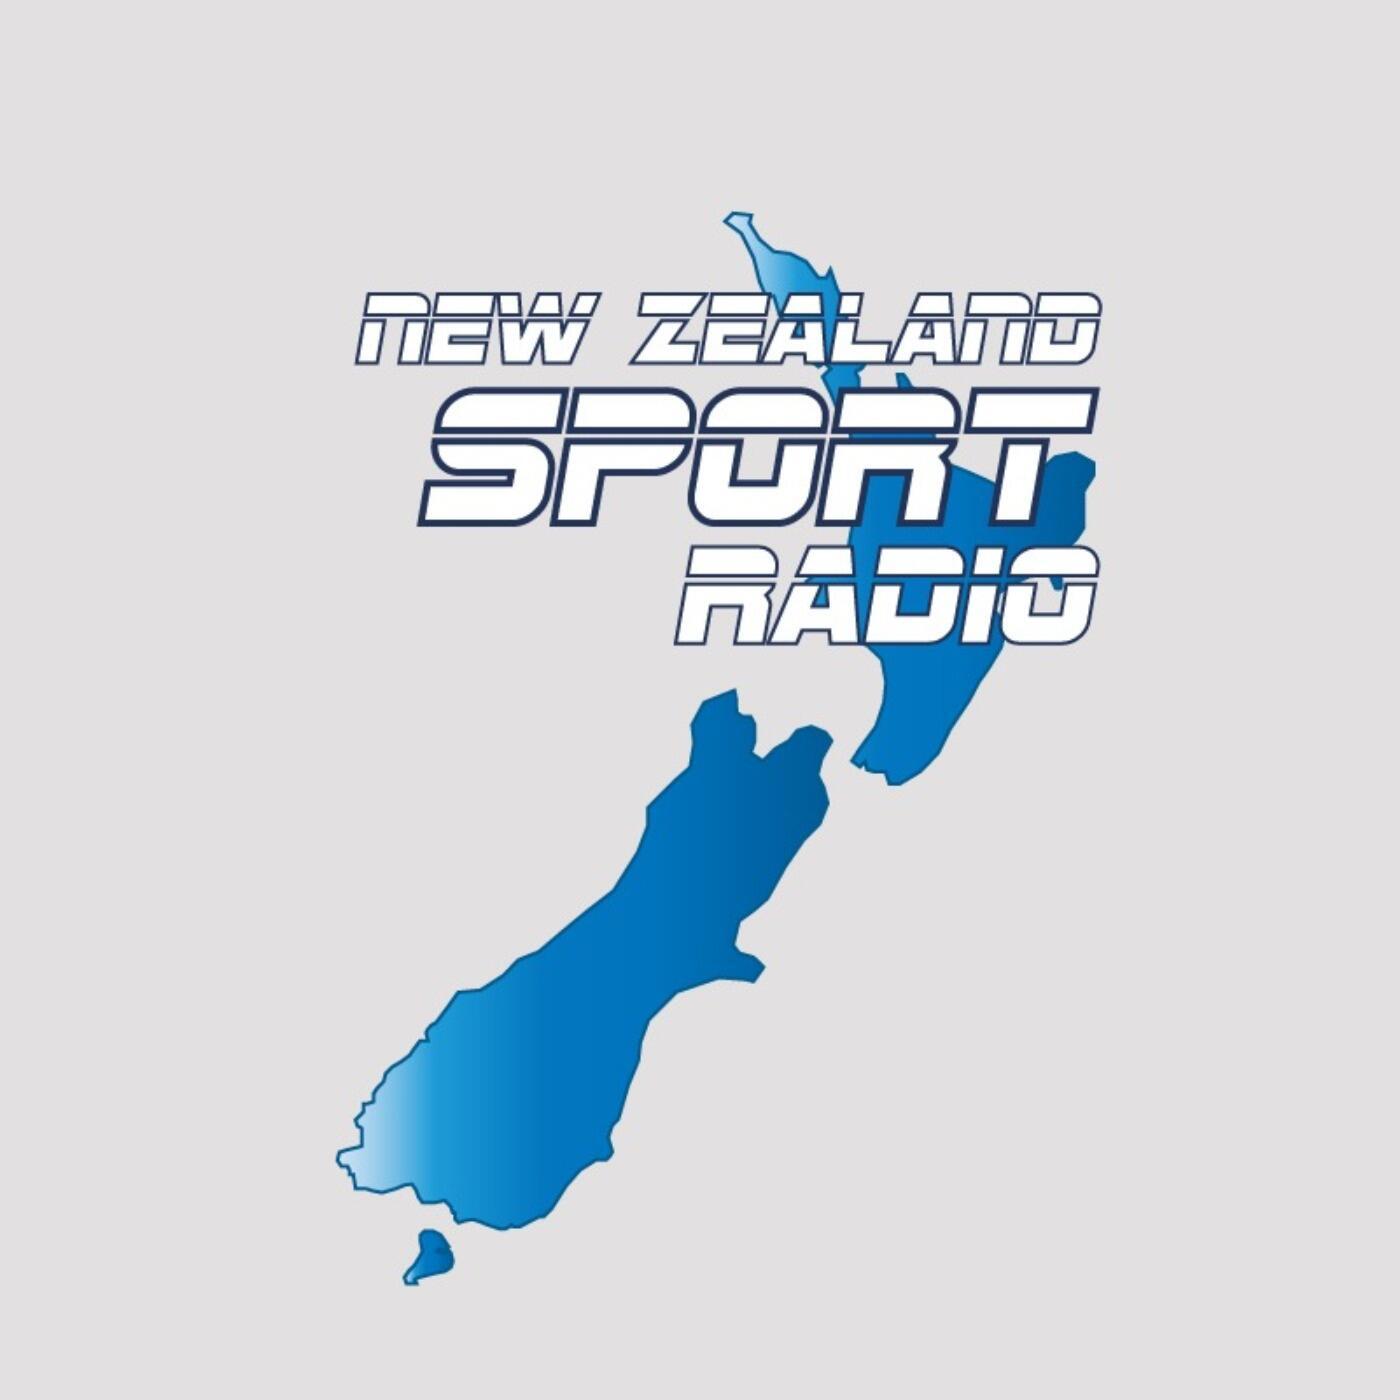 New Zealand Sport Radio